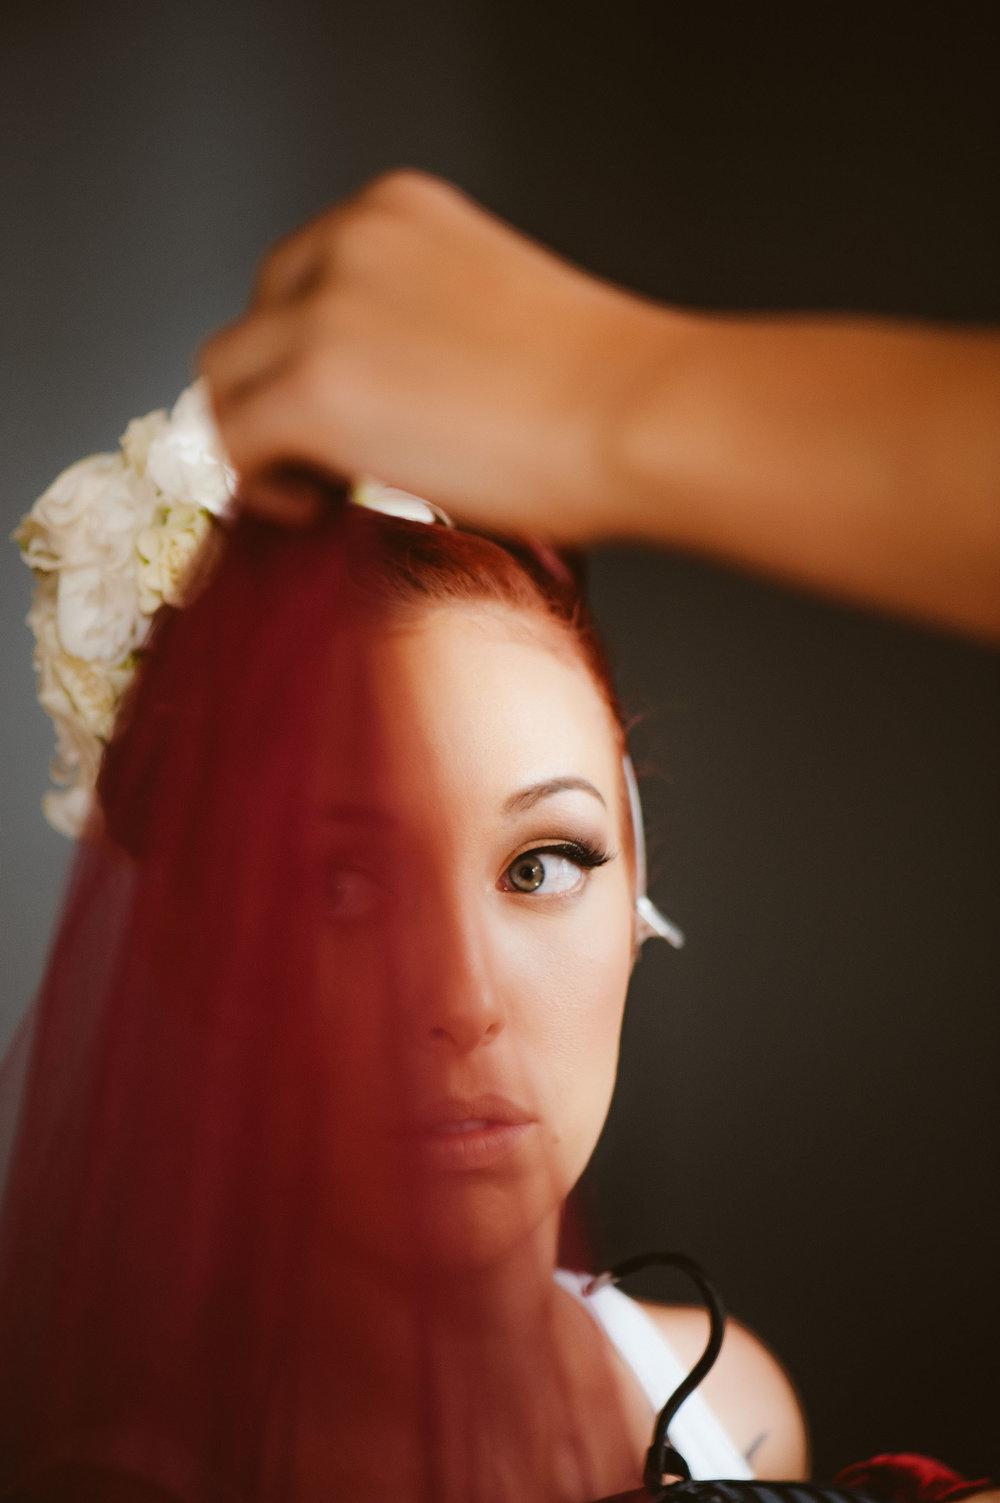 Marryme_wedding_photography_dorrigo_bellingen_photographer_8.jpg